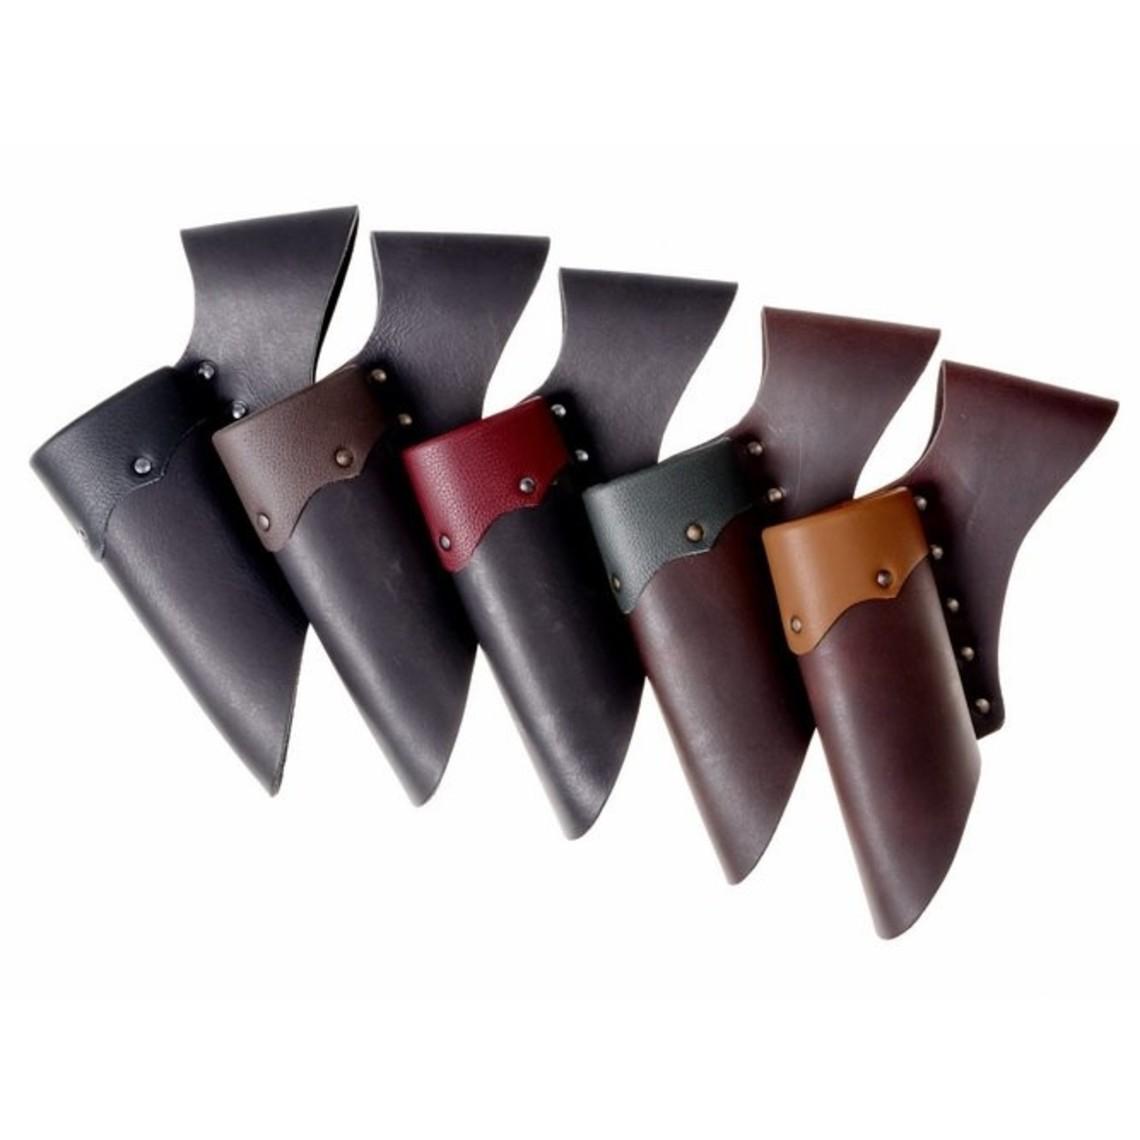 titular de piel para espadas LARP, rojo-negro